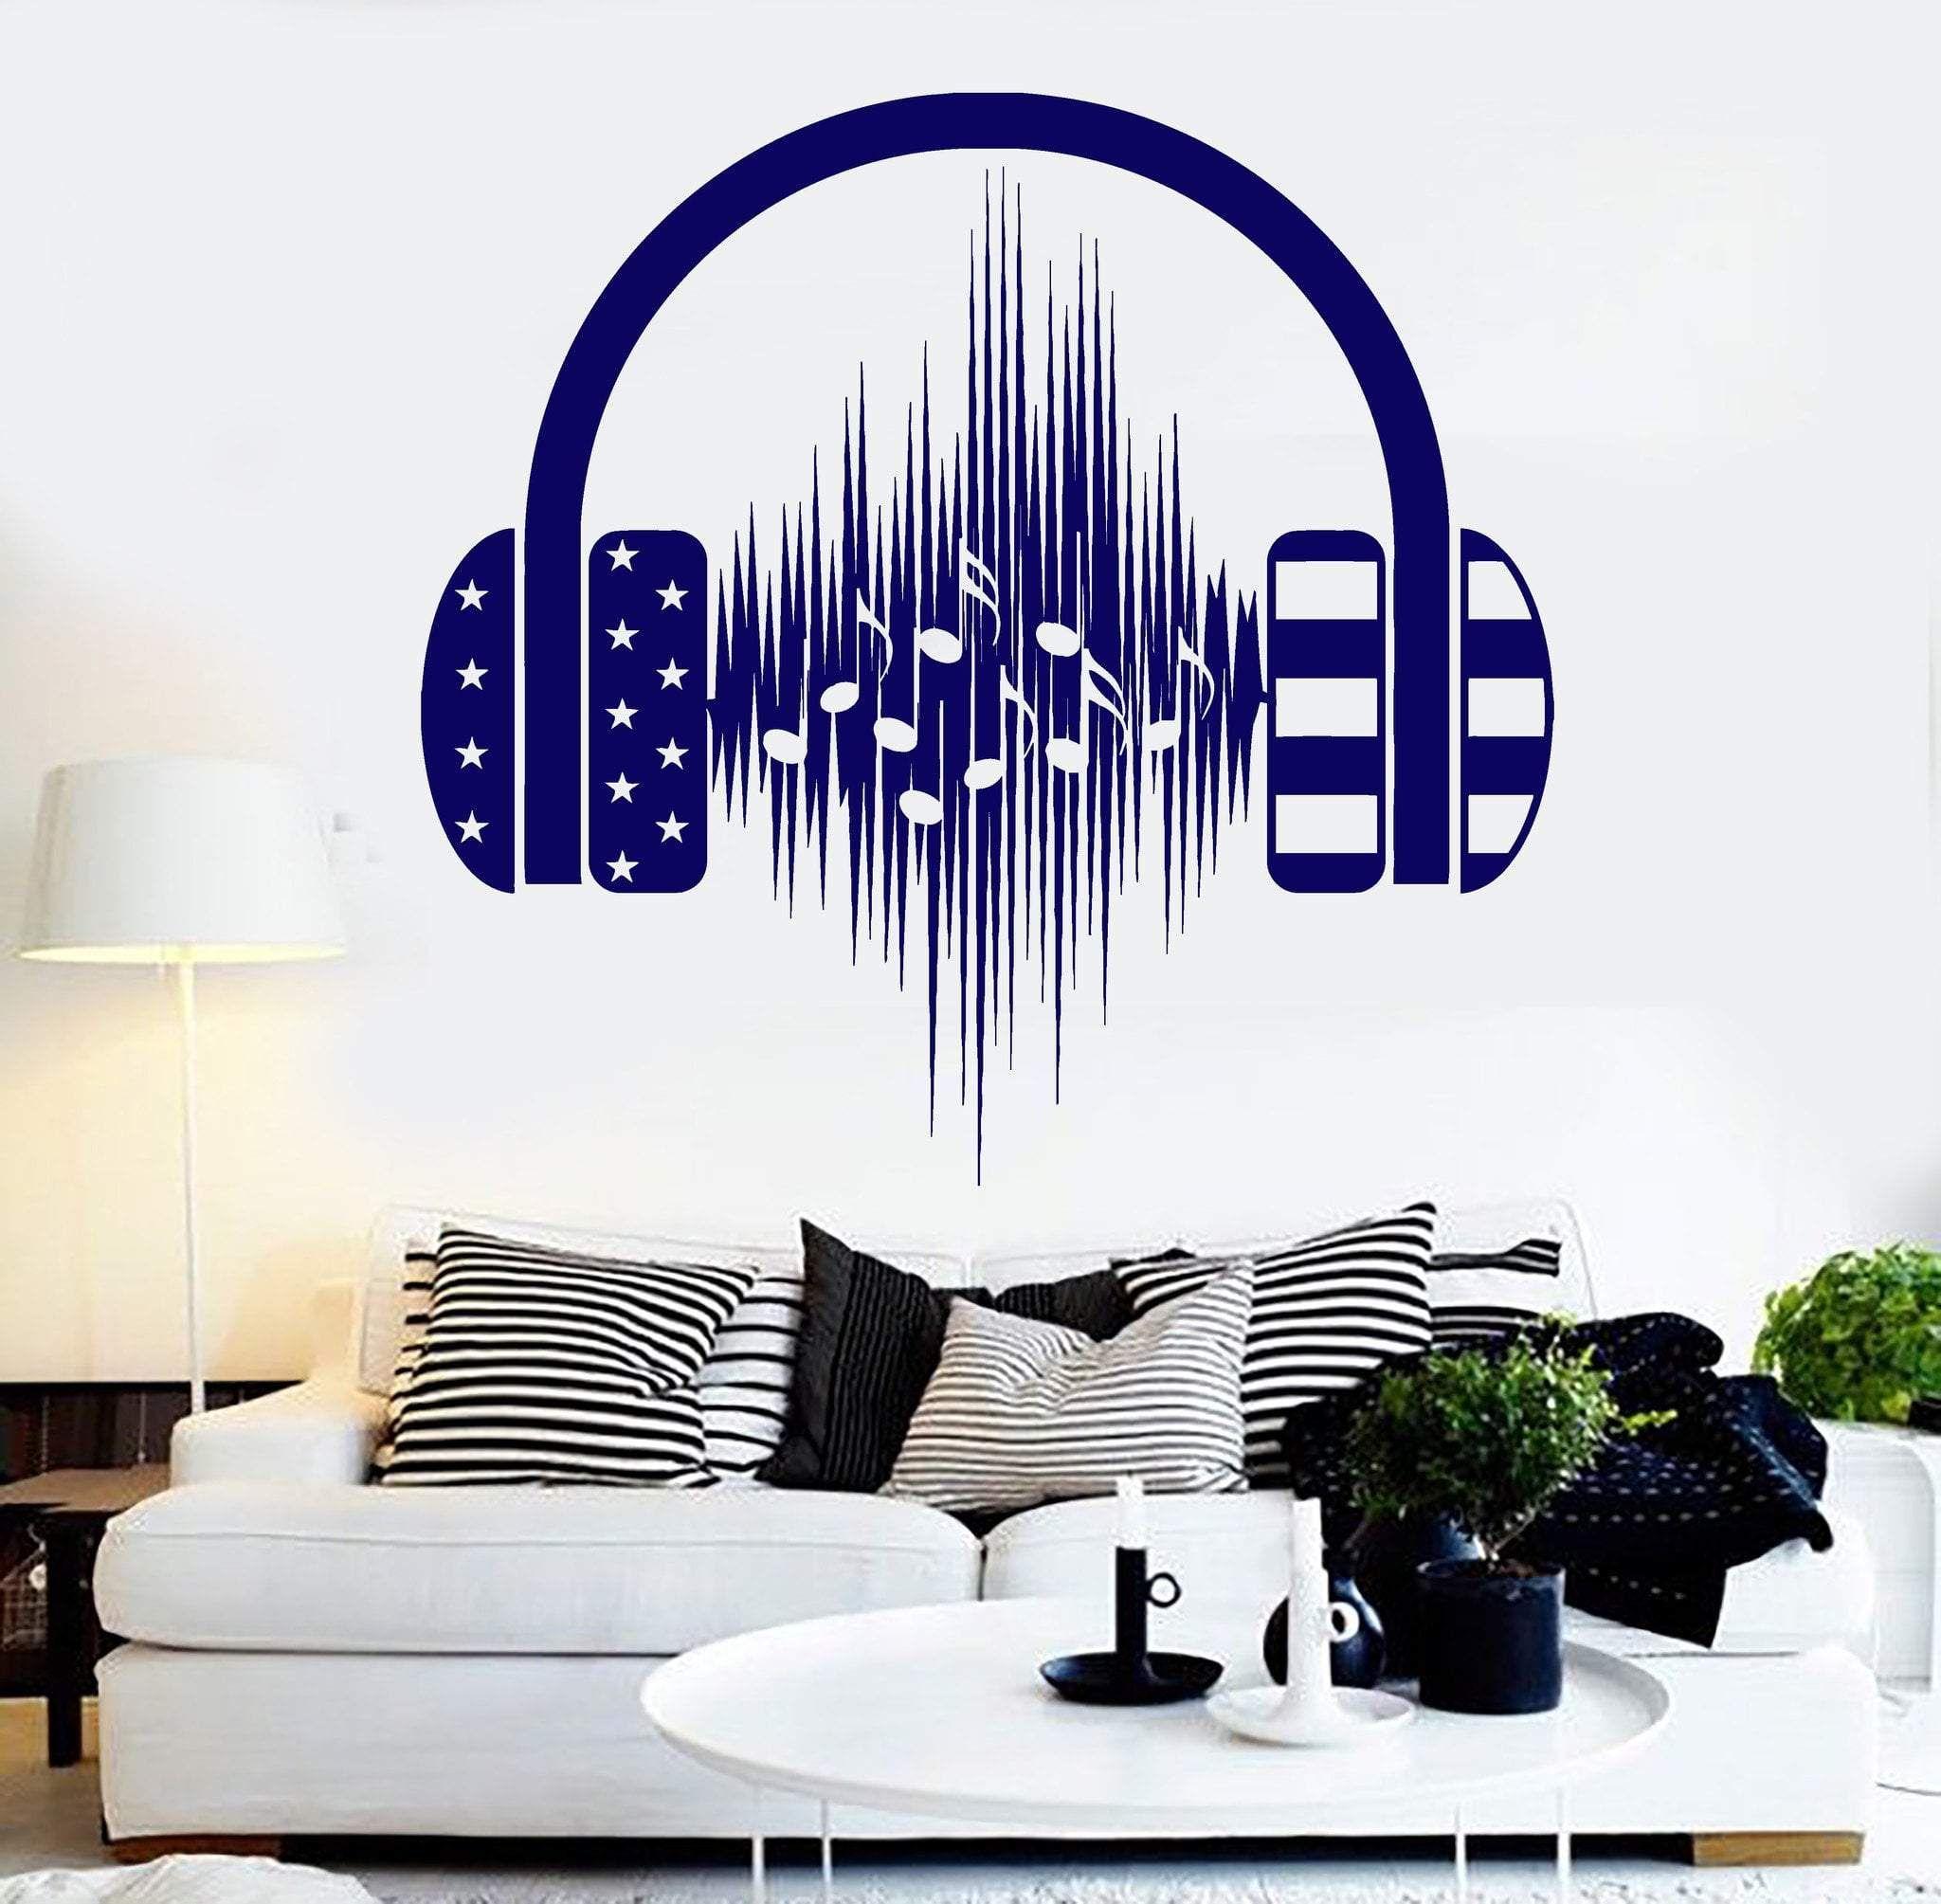 Music Life Sticker Decal Vinyl Headphones Wall Quote Inspiration Musicians Decor